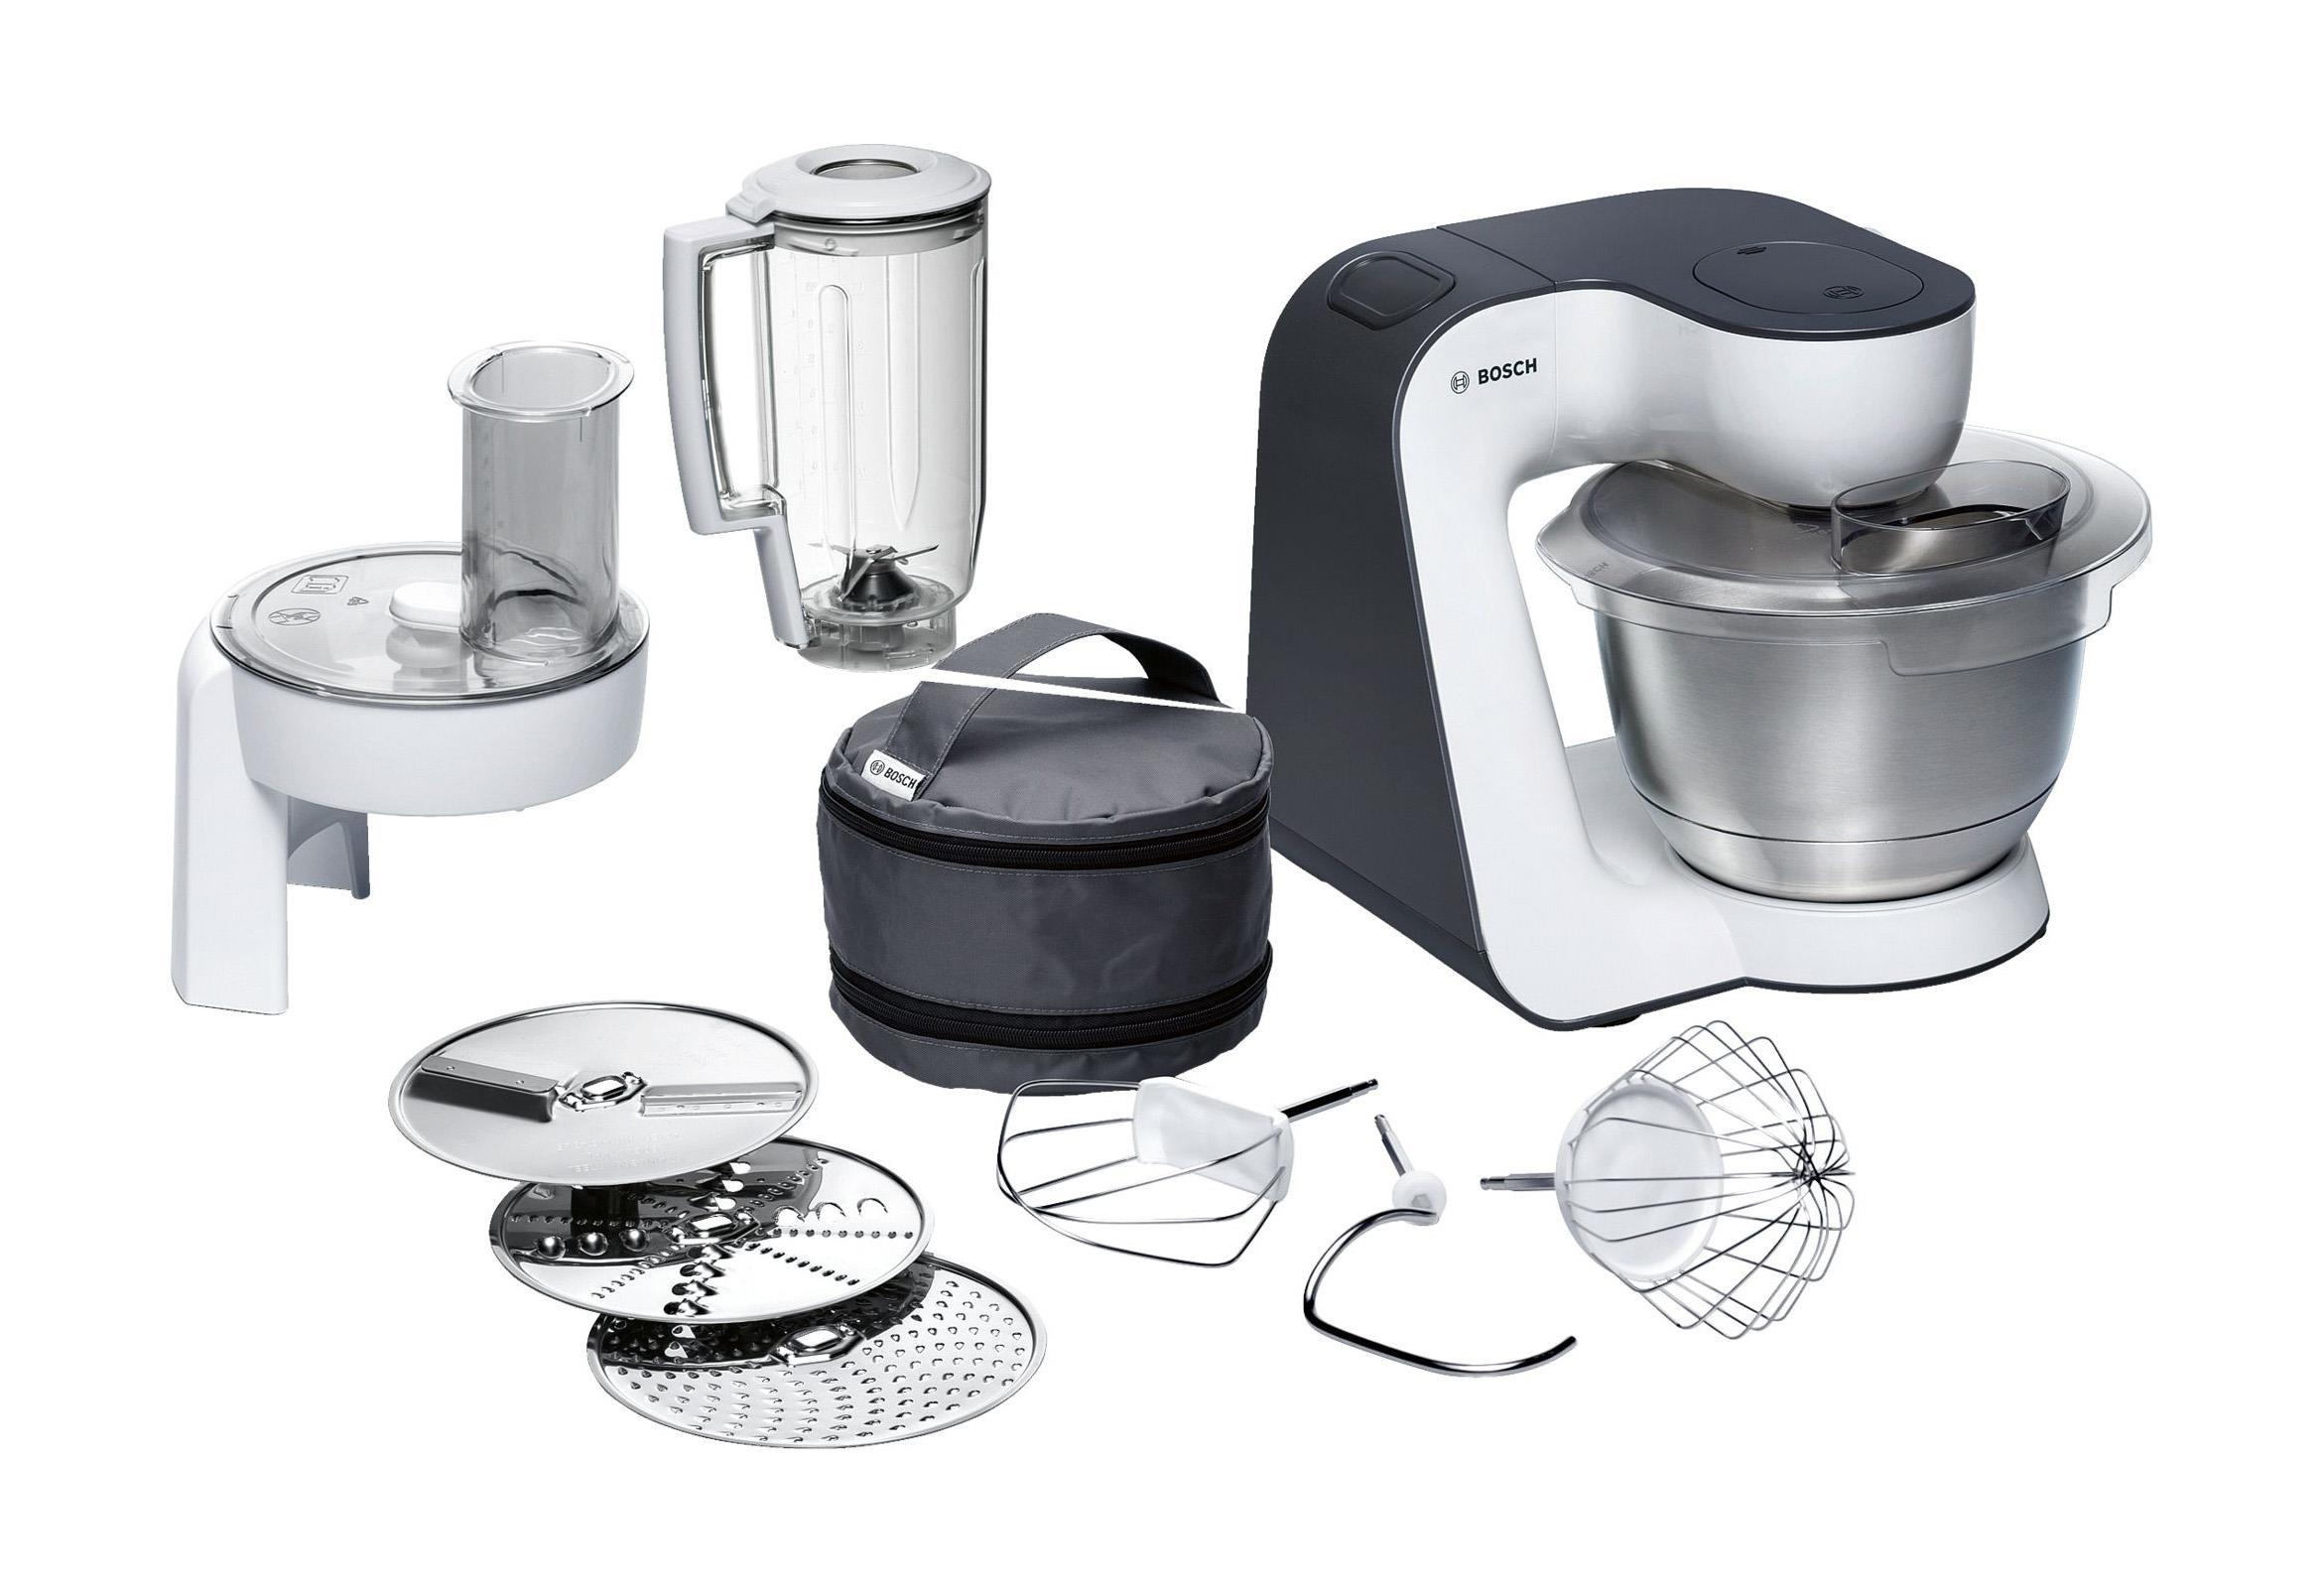 Bosch mum52120 robot de cocina 3,9 l negro, acero inoxidable, transparente, blanco 700 w